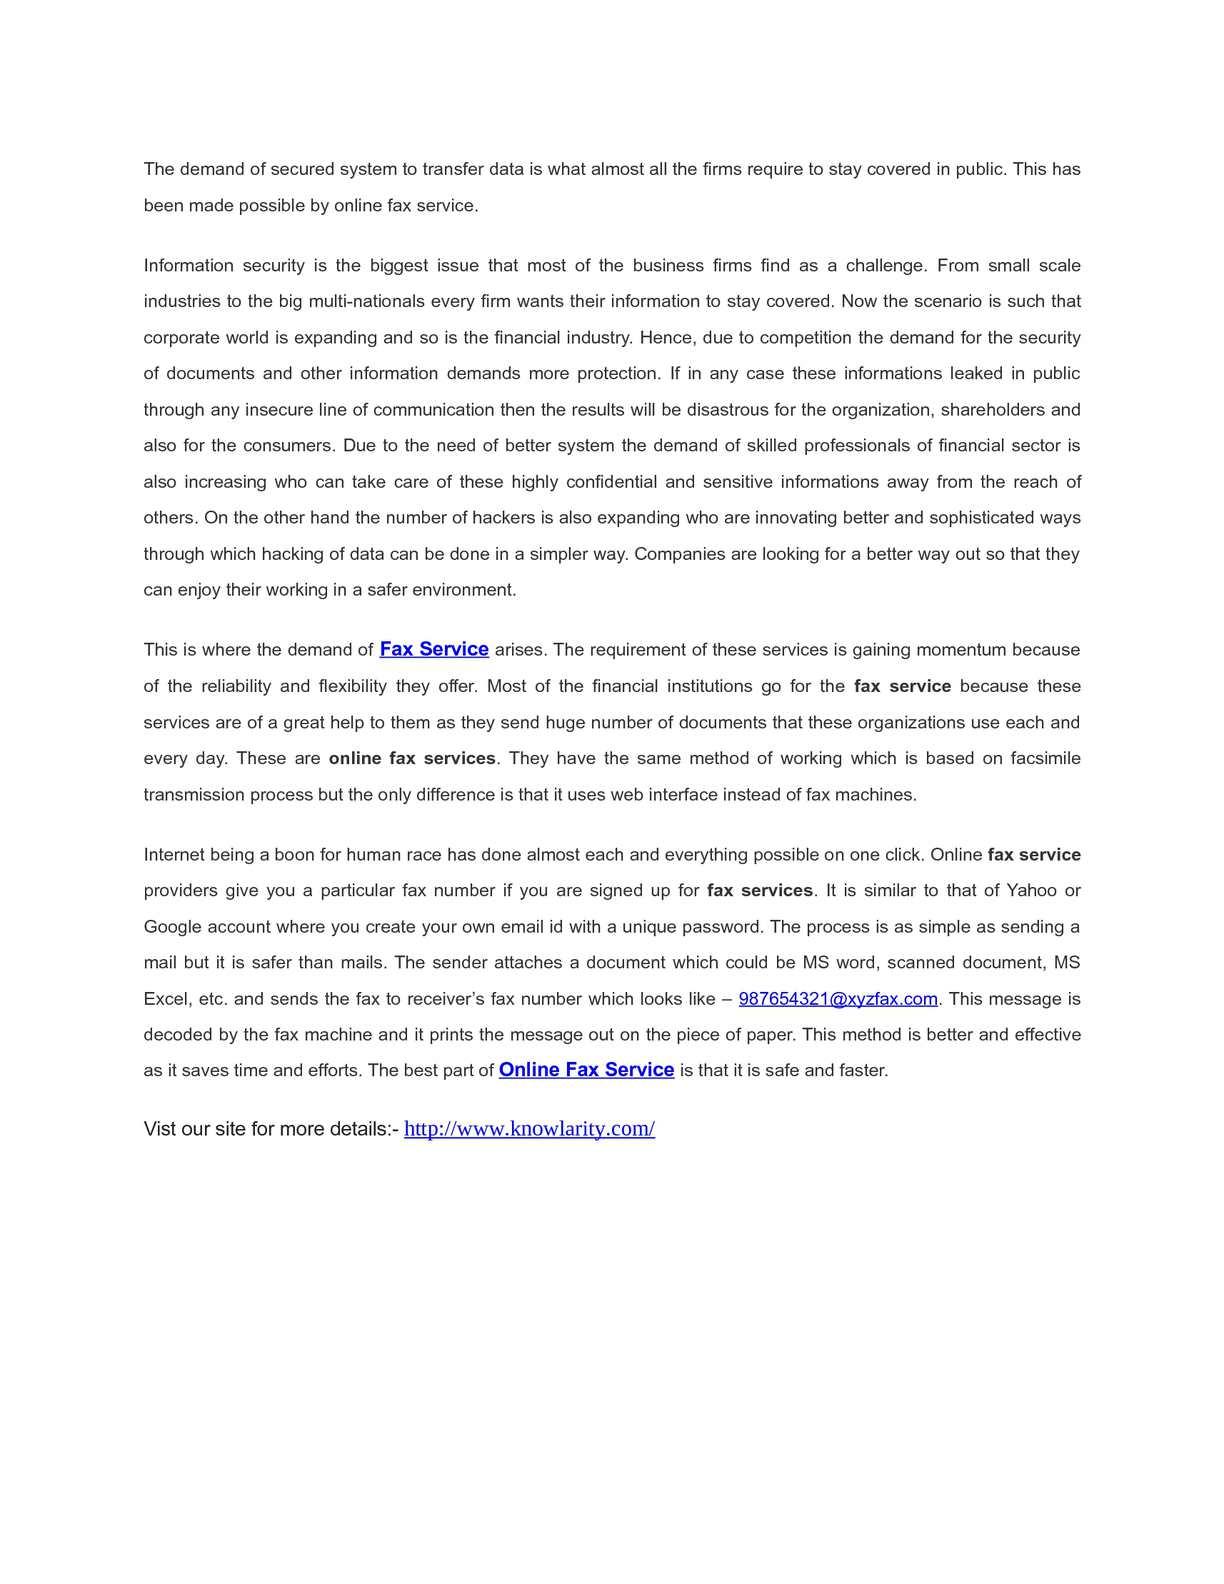 calaméo fax service safest ways to transfer precious documents